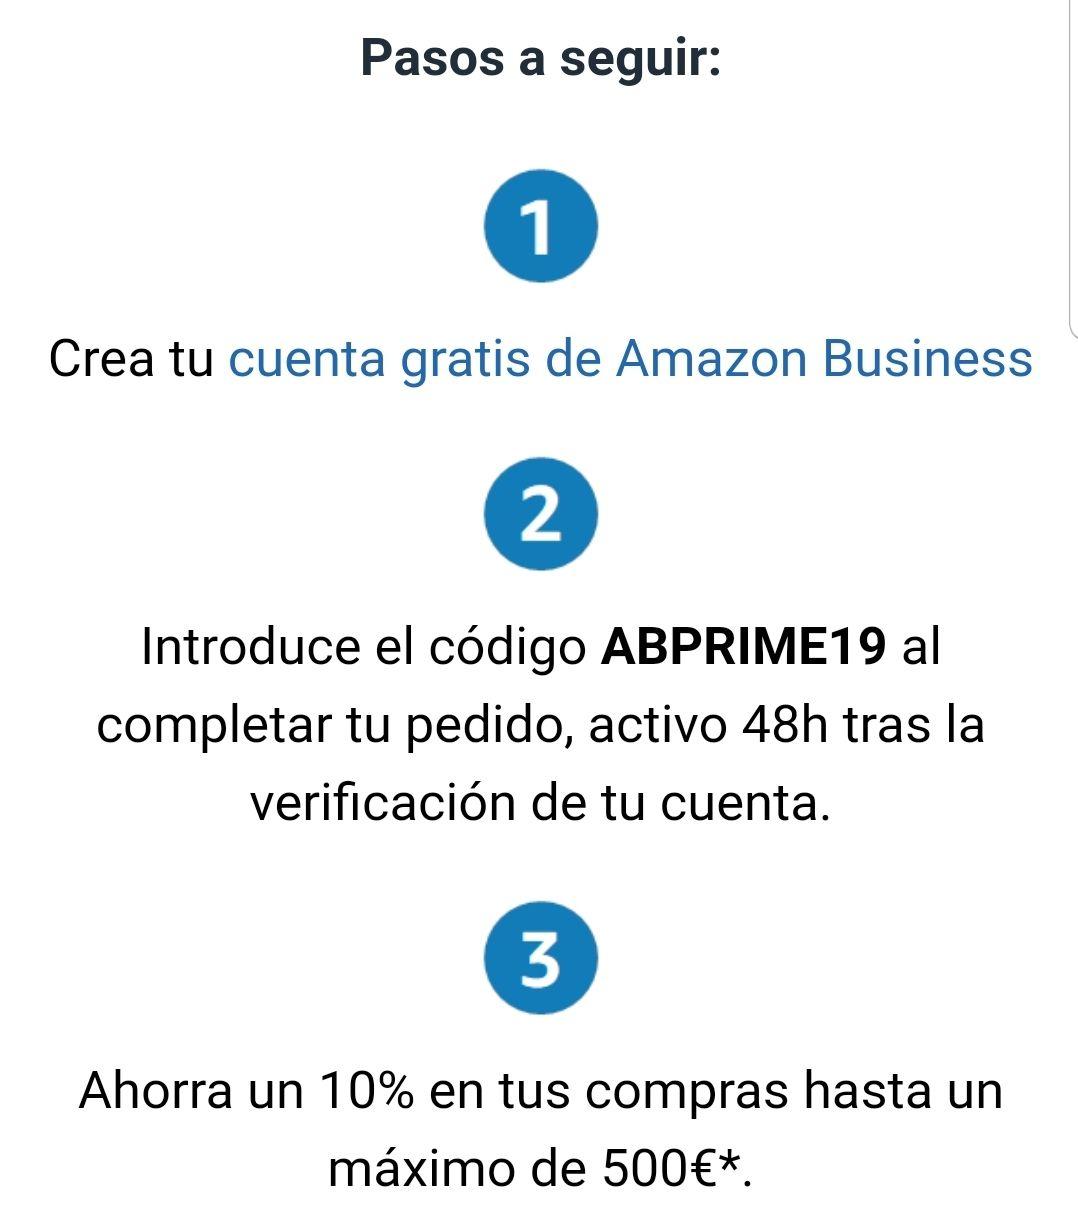 Oferta de Prime Day para Empresas: 10% hasta un máximo de 500€. (Solo nuevos usuarios Amazon Business)